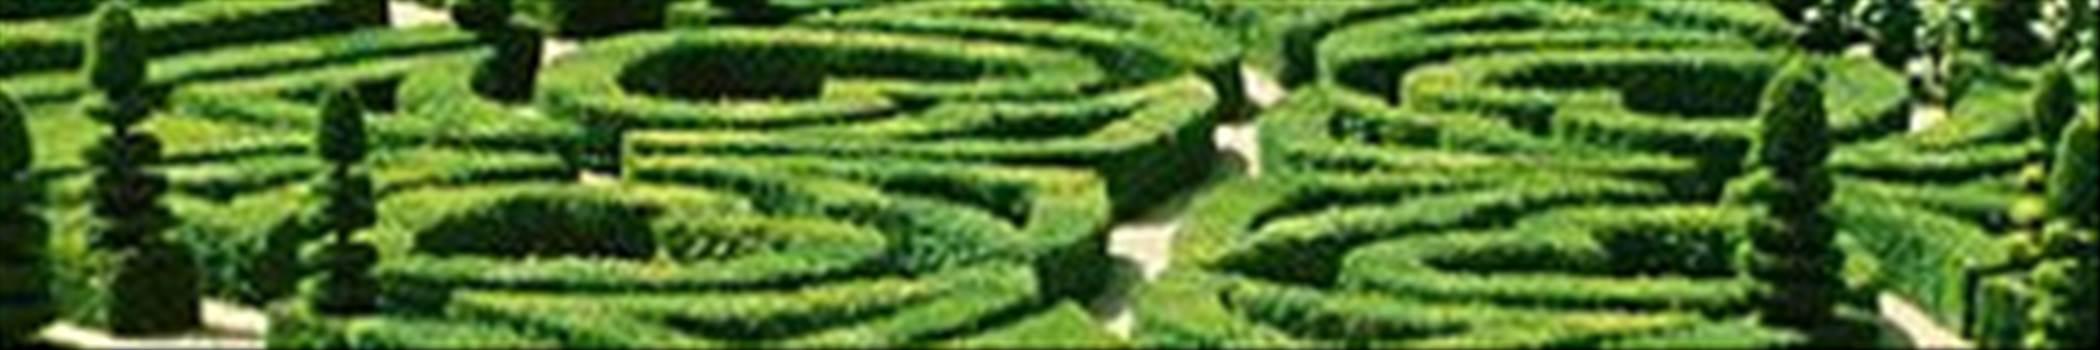 gardens.jpg by shoresofelysium